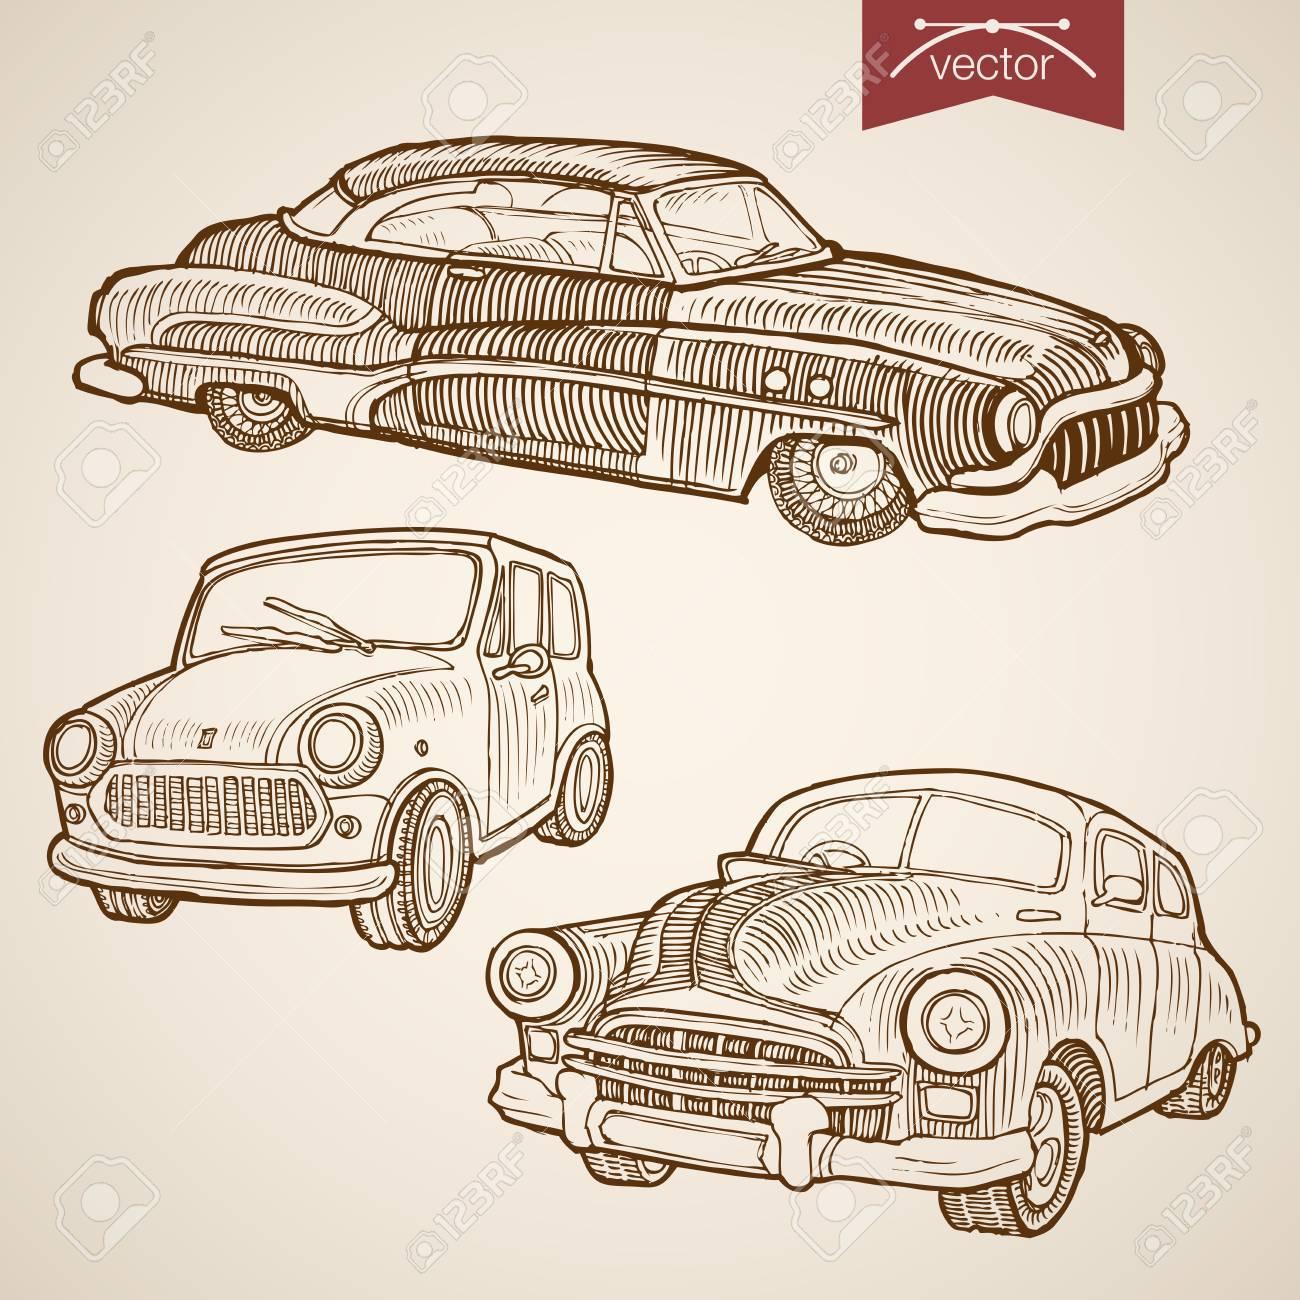 Engraving vintage hand drawn vector retro car collection. Pencil Sketch wheeled transport illustration. - 60587954